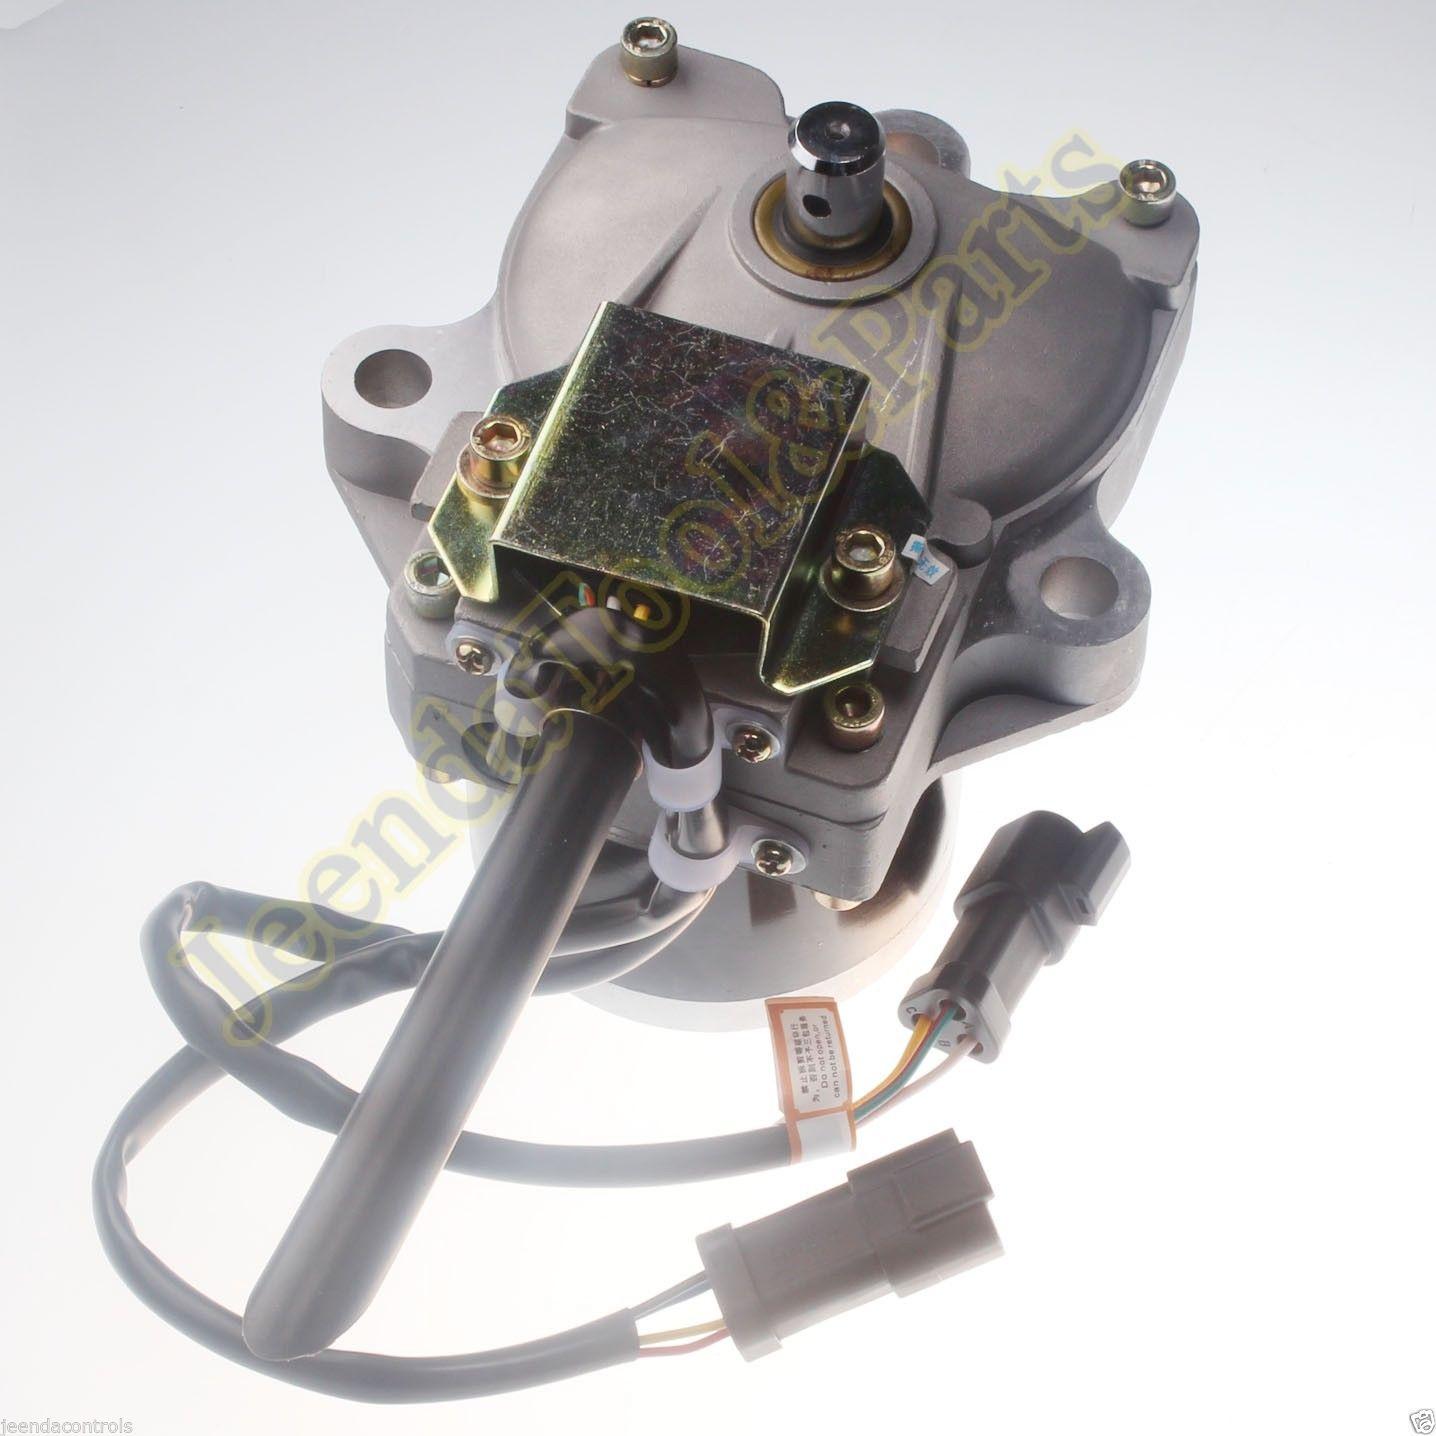 Ship from USA throttle motor,Stepping motor 7834-41-2000 for Komatsu PC200//220-7